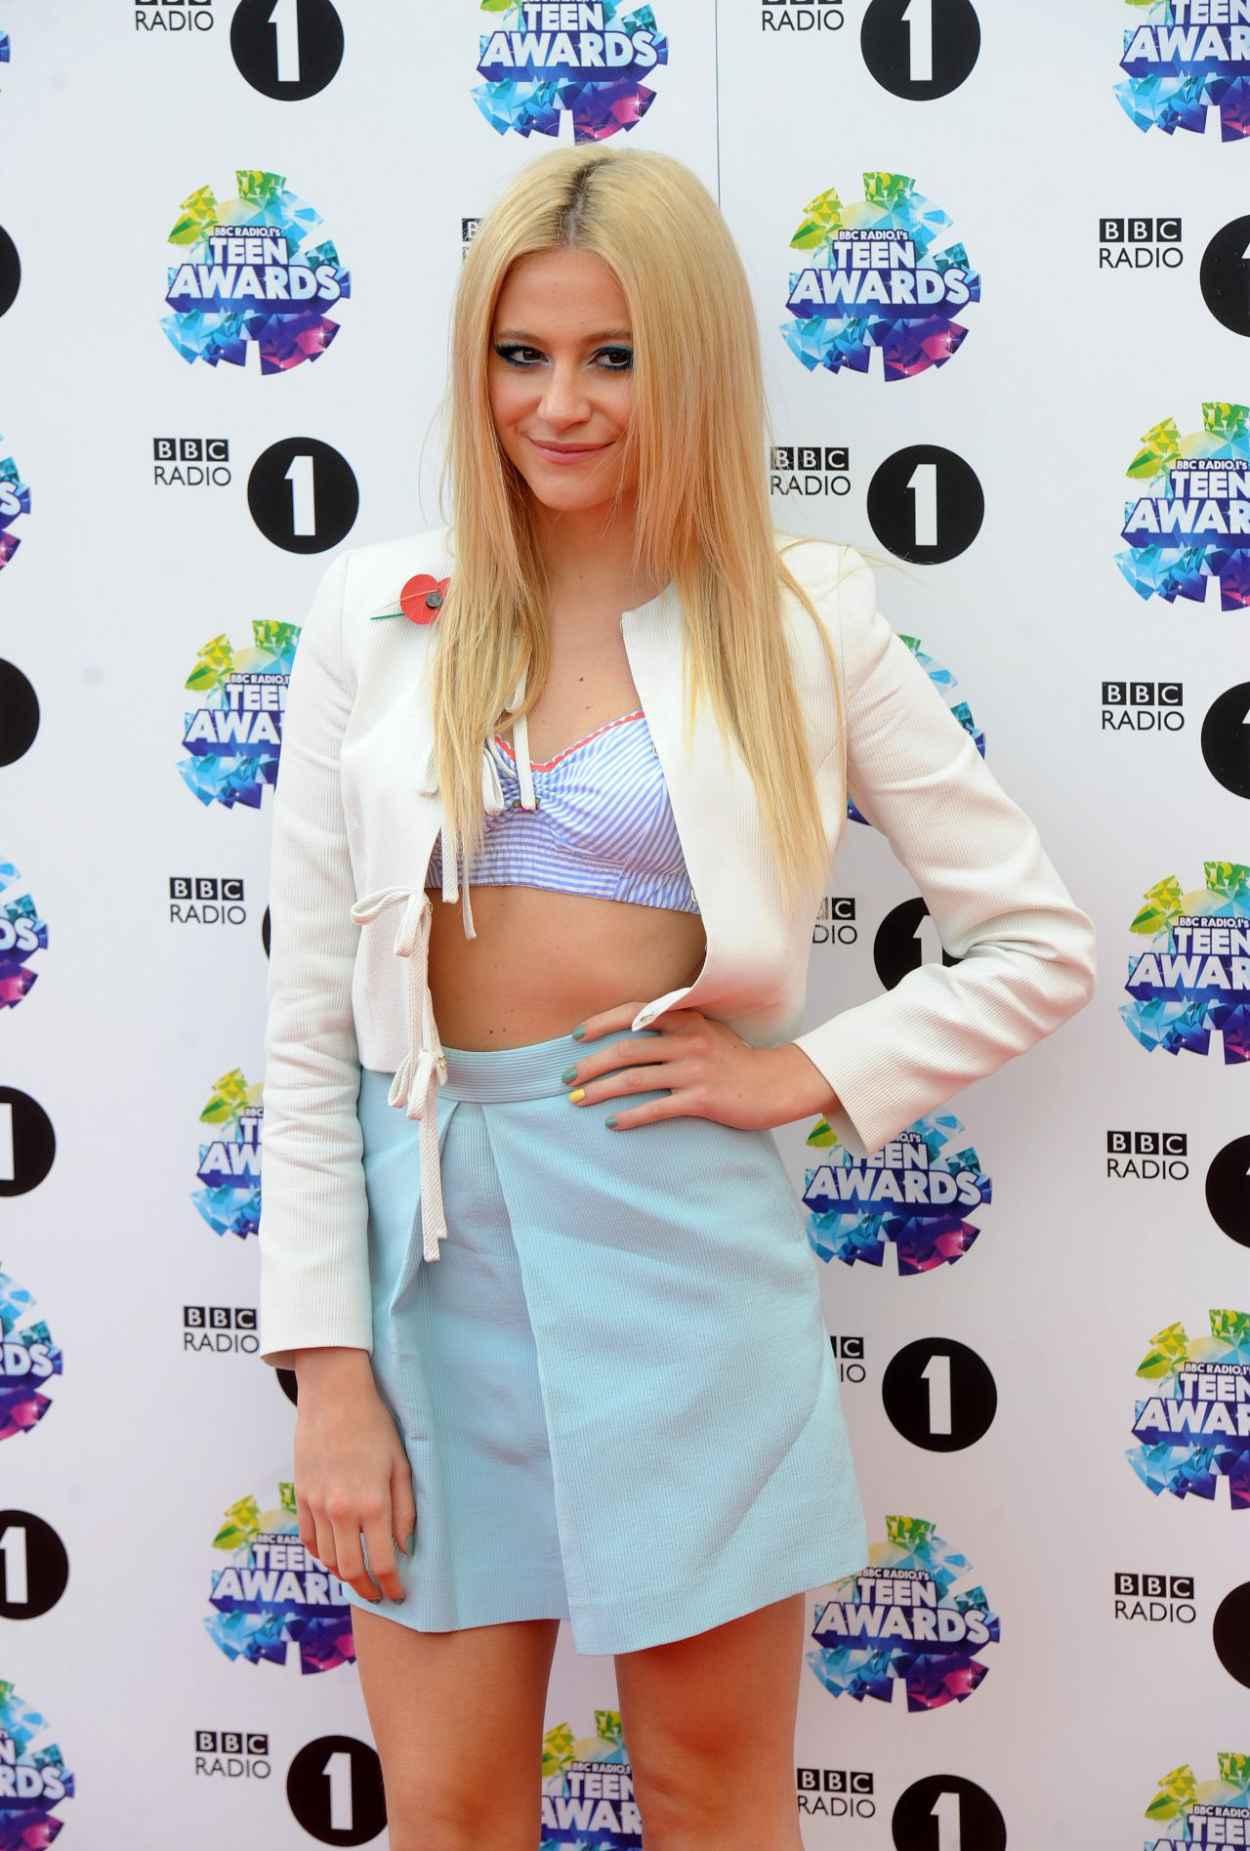 Pixie Lott on Red Carpet - BBC Radio 1 Teen Awards in London-3